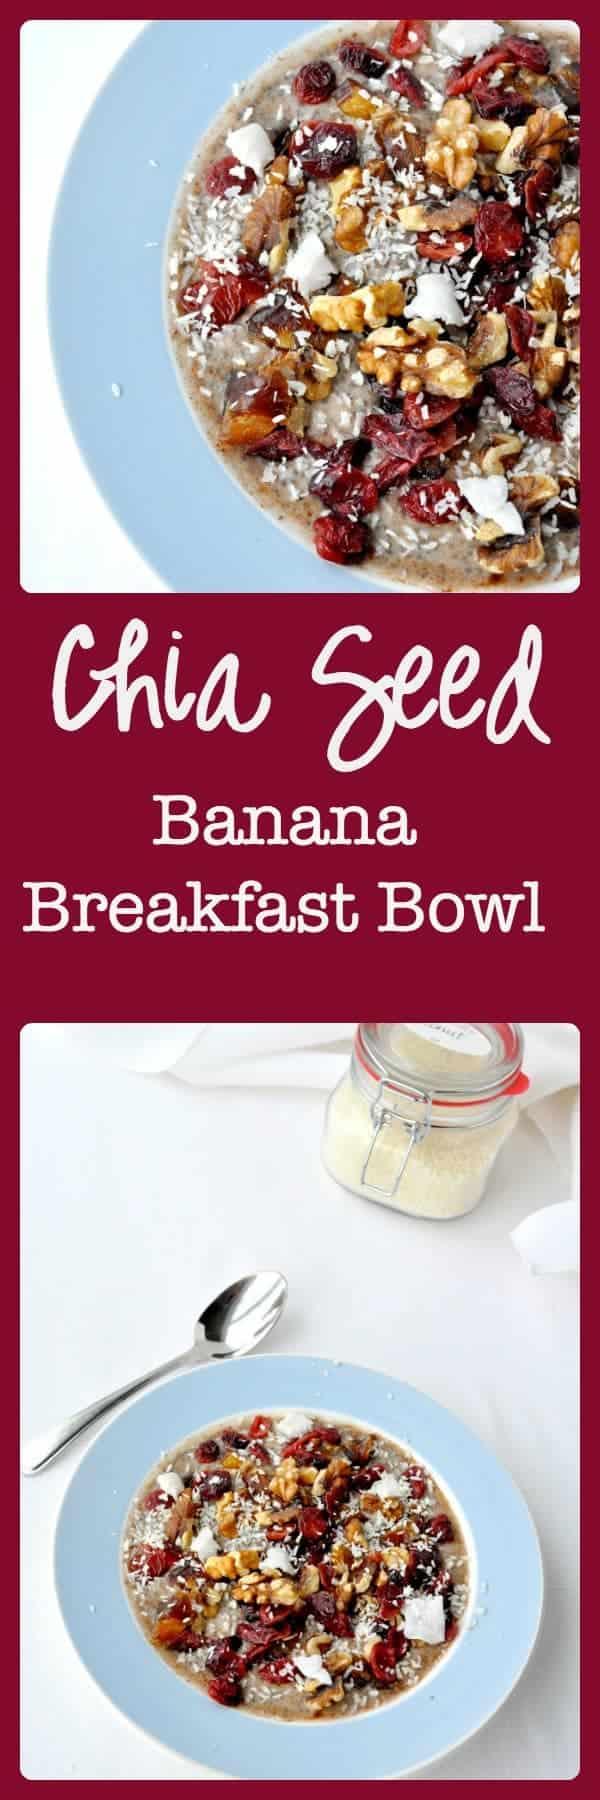 Chia Seed Banana Breakfast Bowl.